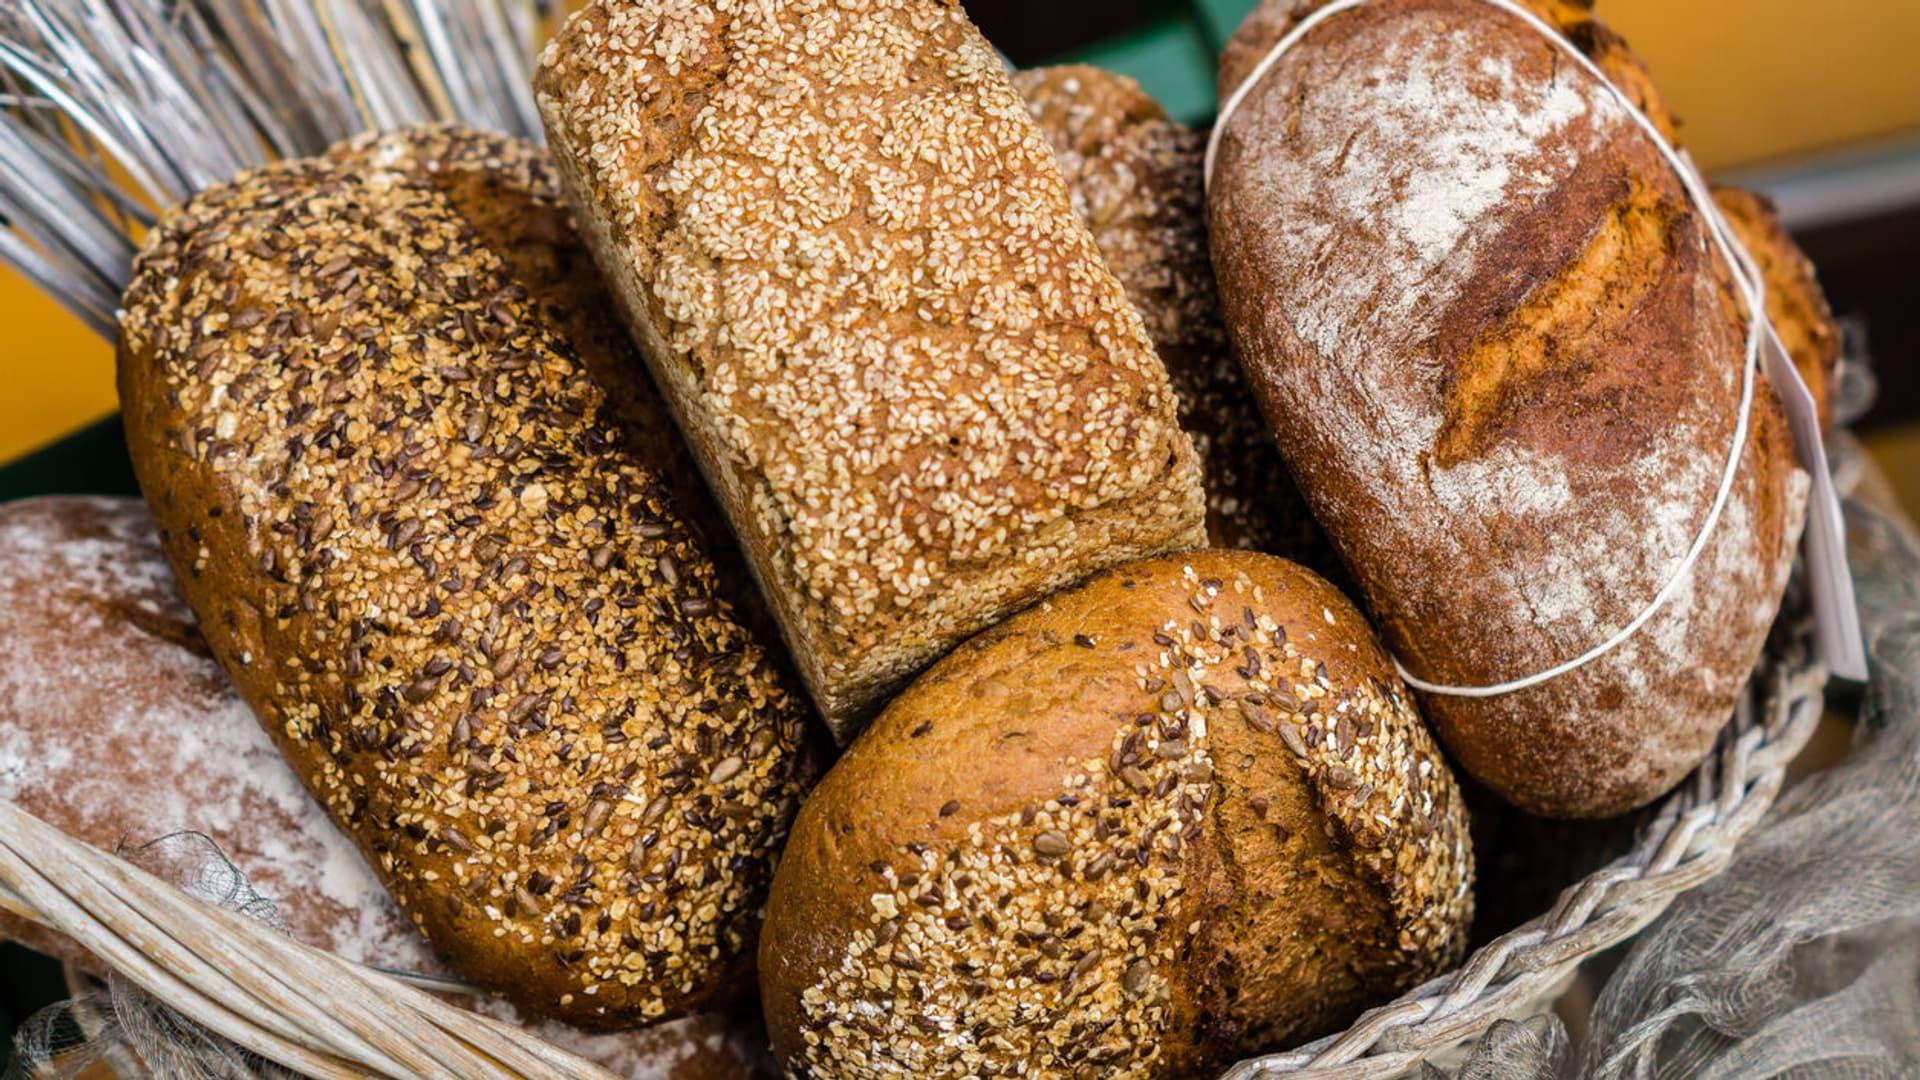 Brotlaibe in einem Korb